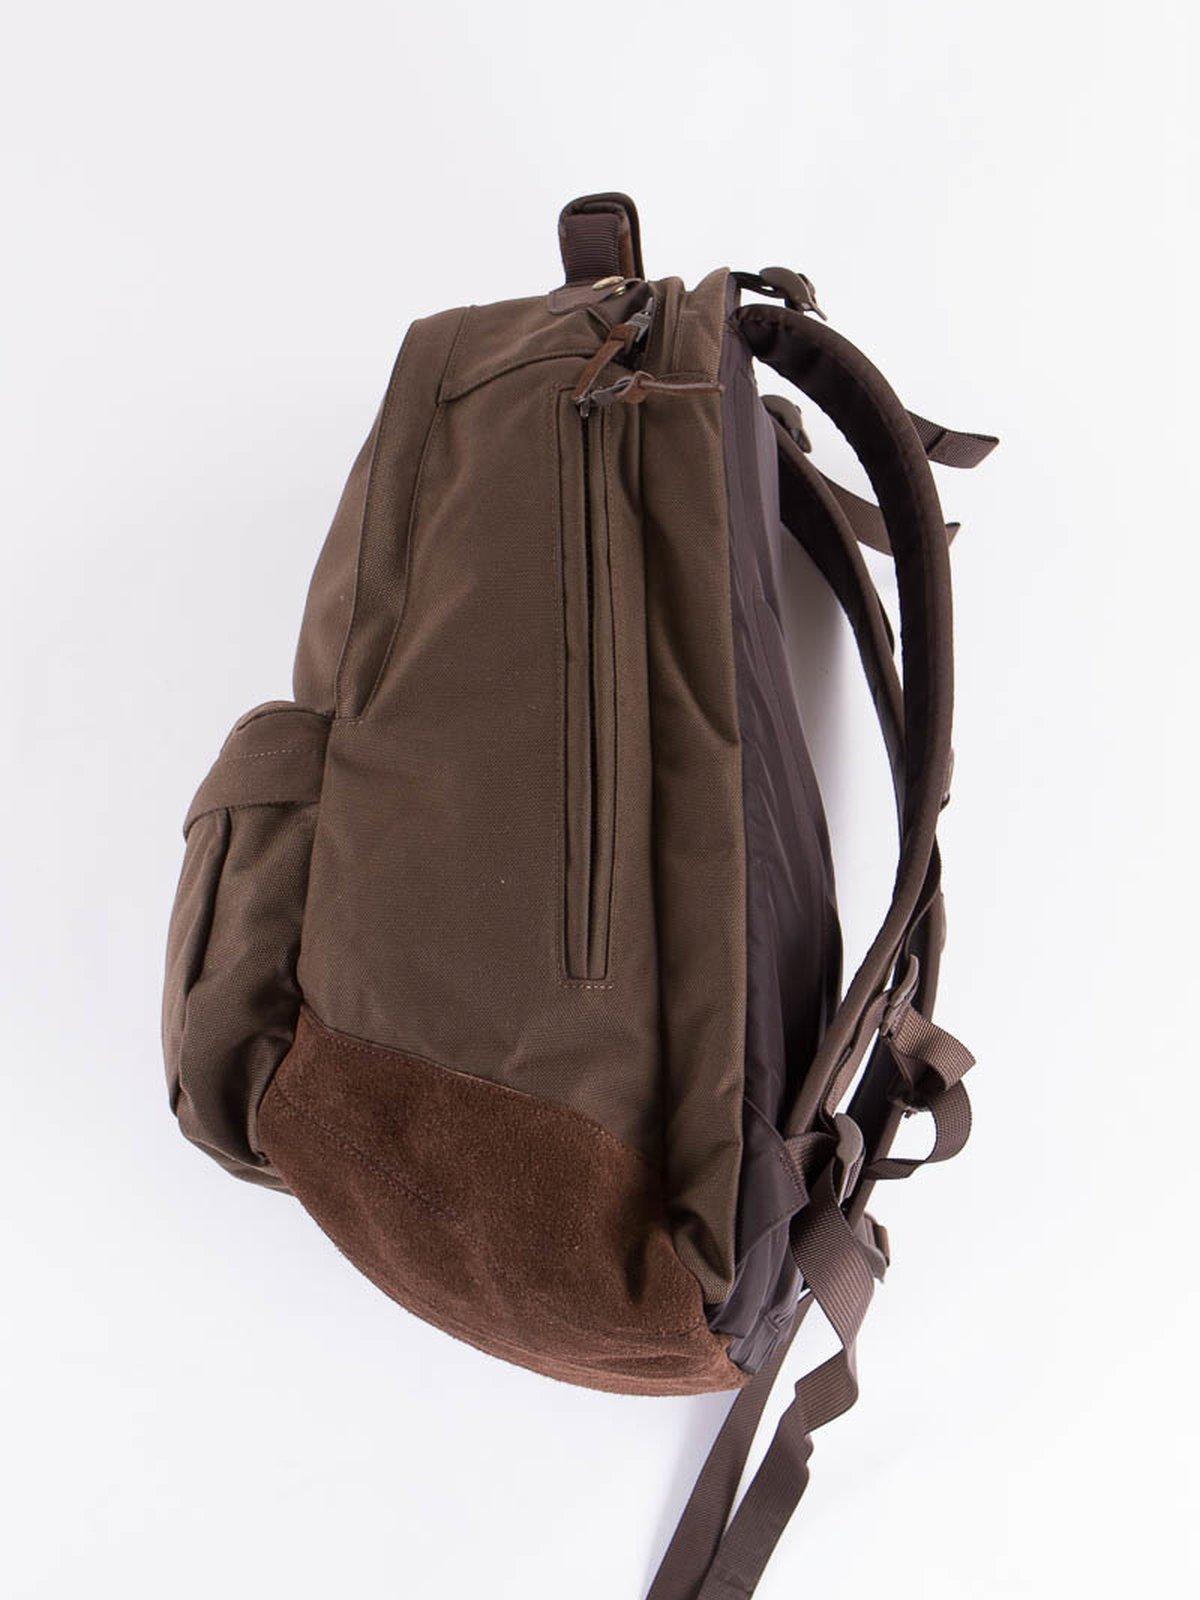 Brown 22L Ballistic Backpack - Image 4